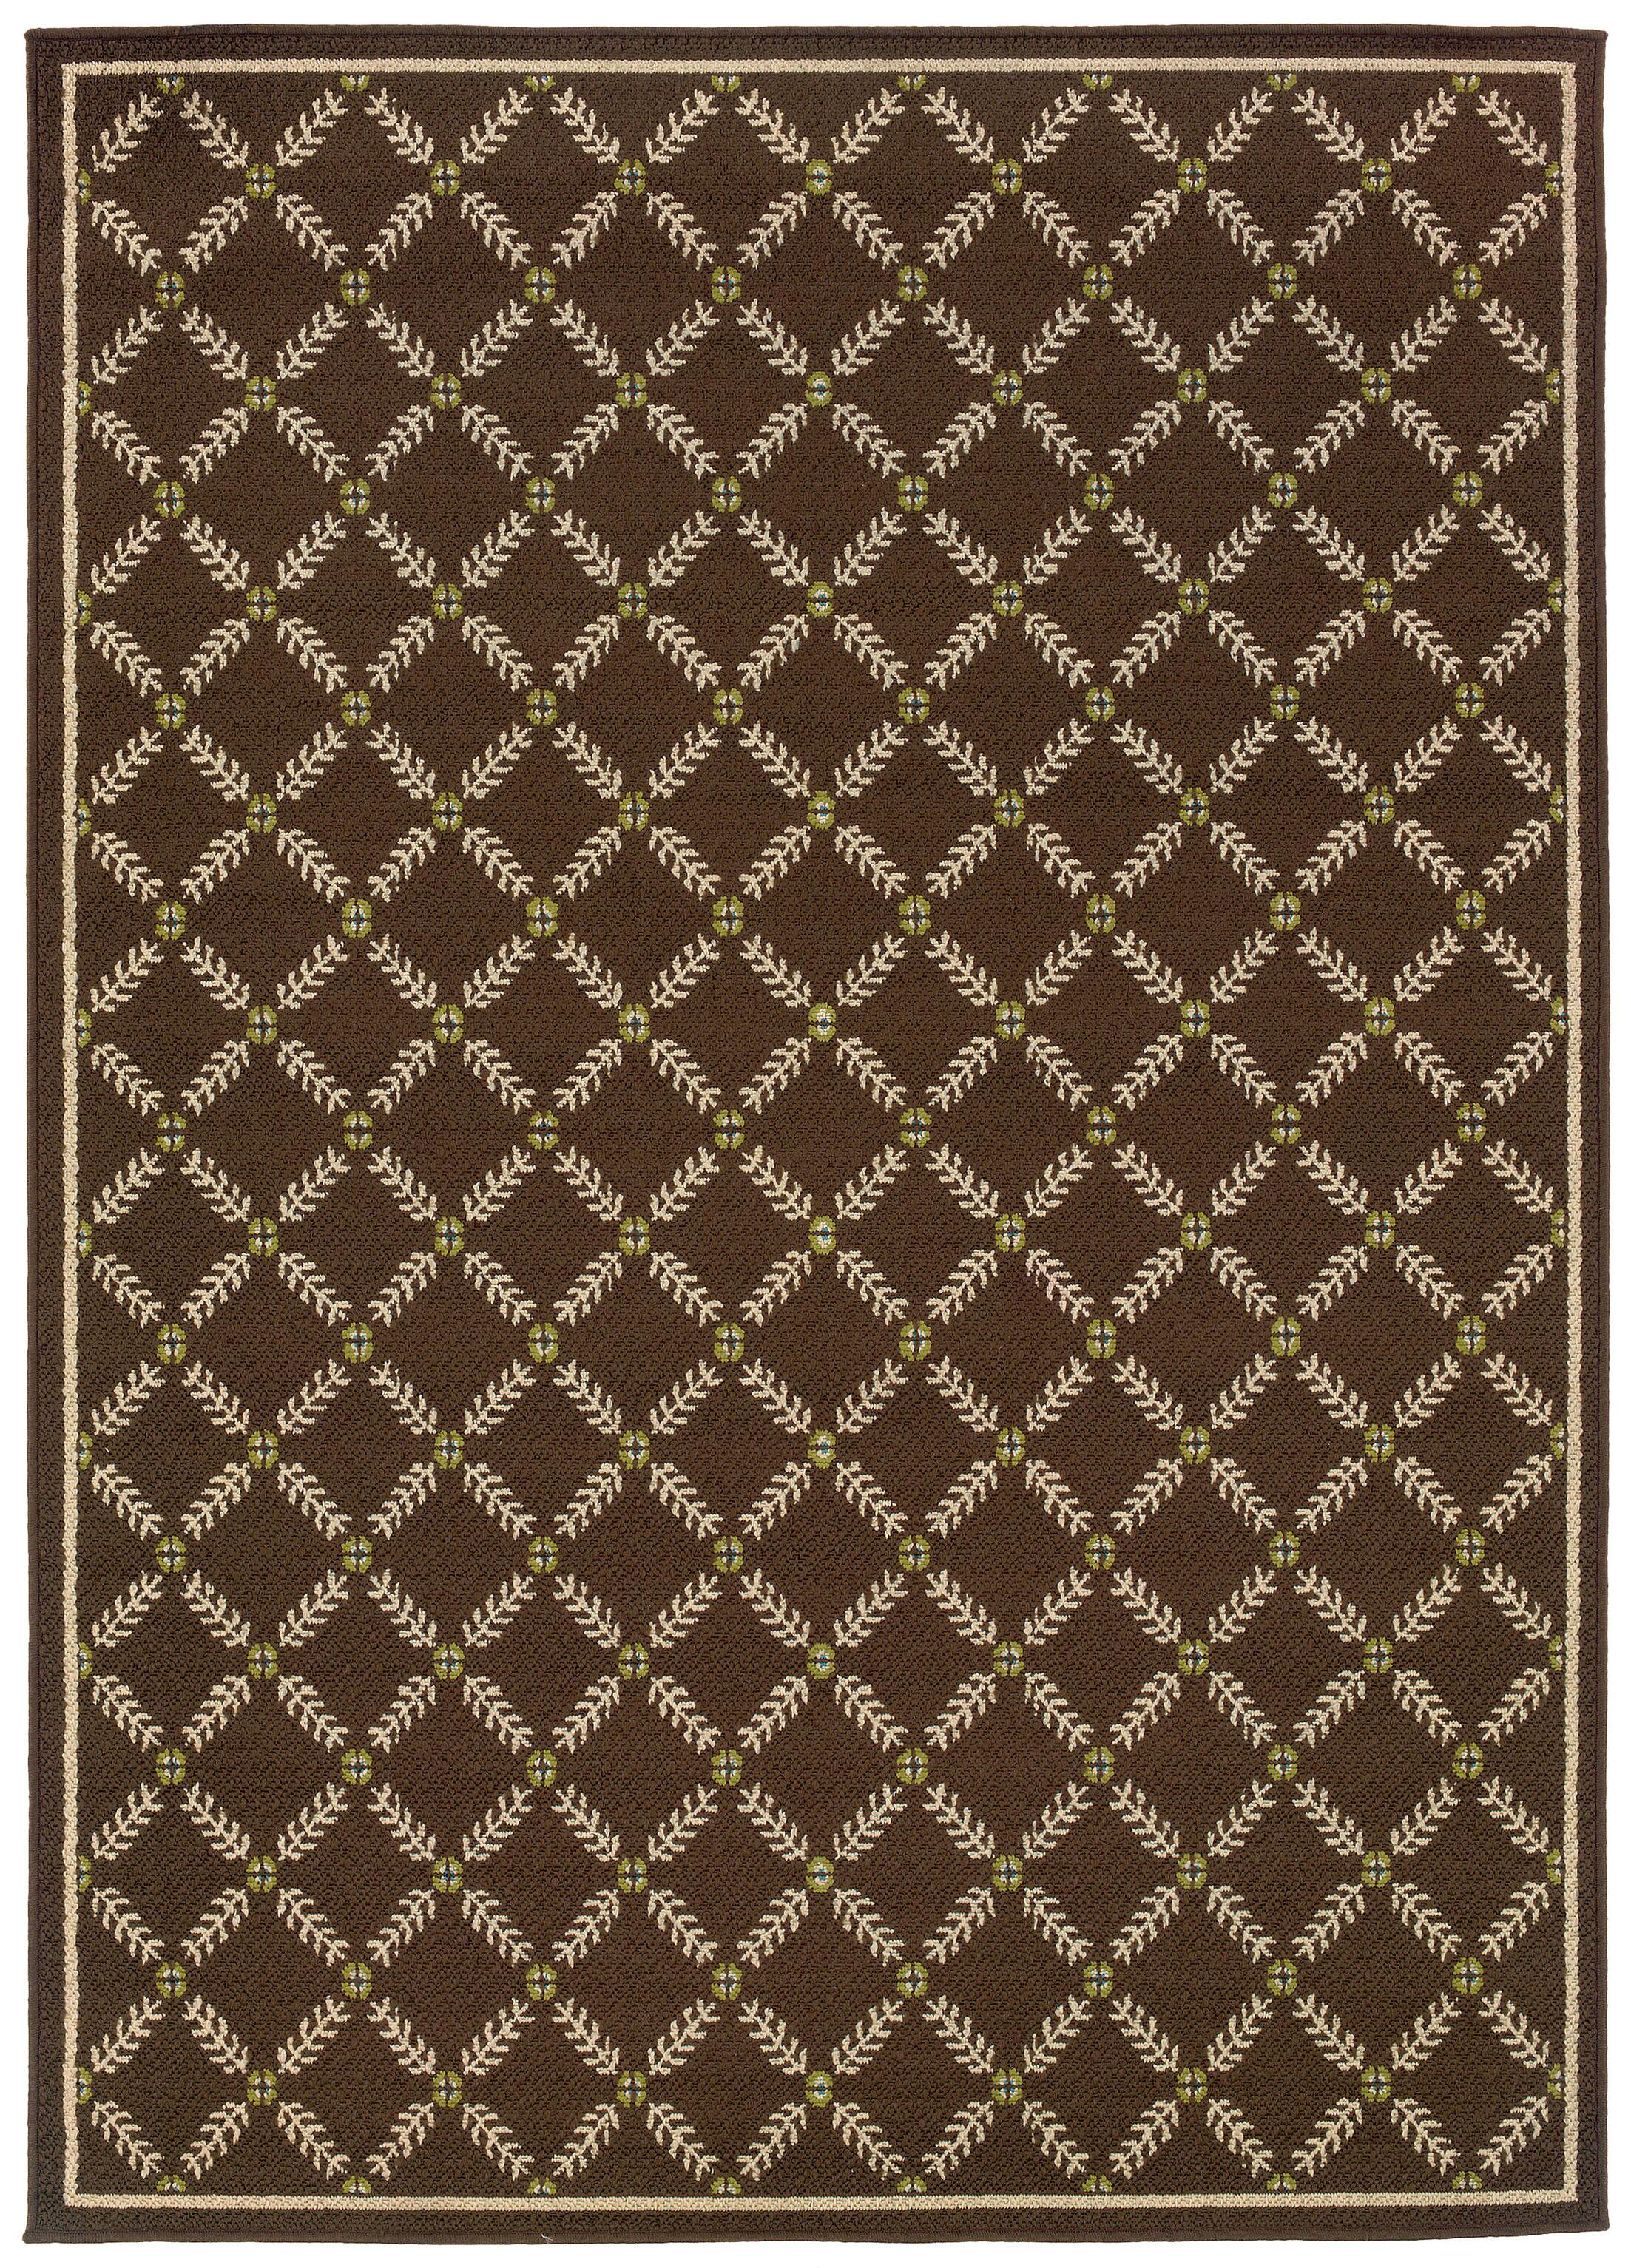 Newfield Brown/Ivory Indoor/Outdoor Area Rug Rug Size: Rectangle 5'3